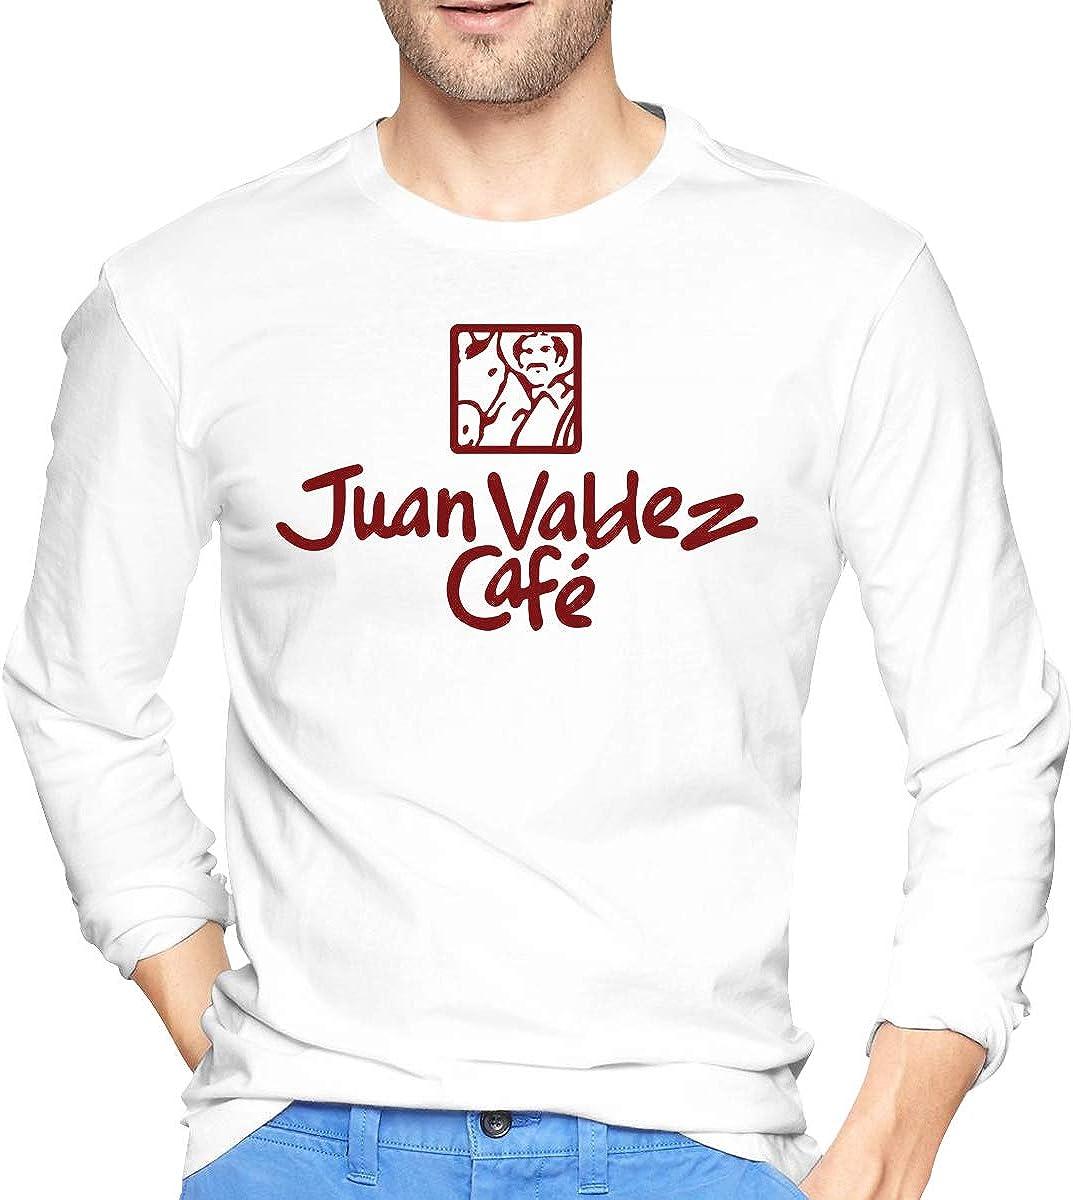 Mens Long Sleeve T-Shirts Juan Valdez Cafe Printed Casual Street Wear Trendy Tee Shirt